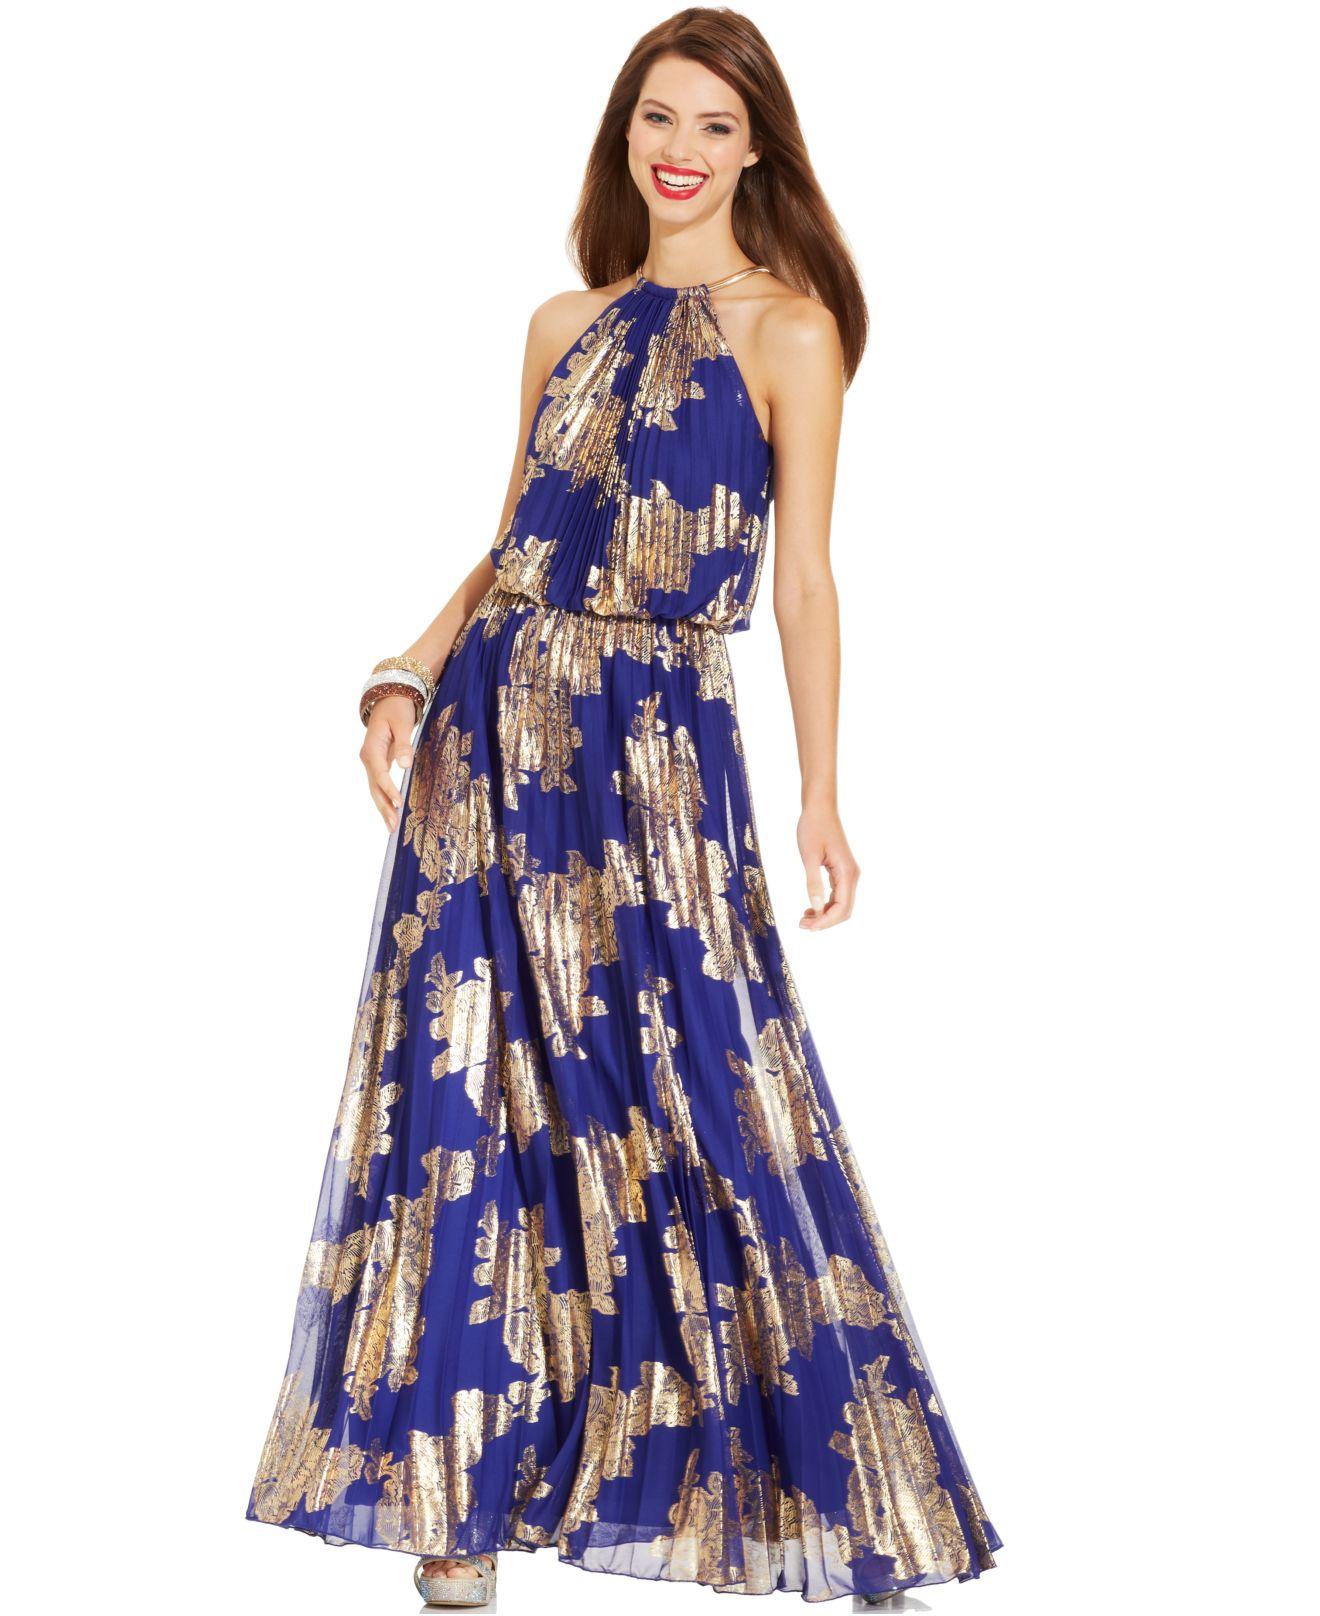 Lyst - Xscape Petite Sleeveless Pleated Halter Gown